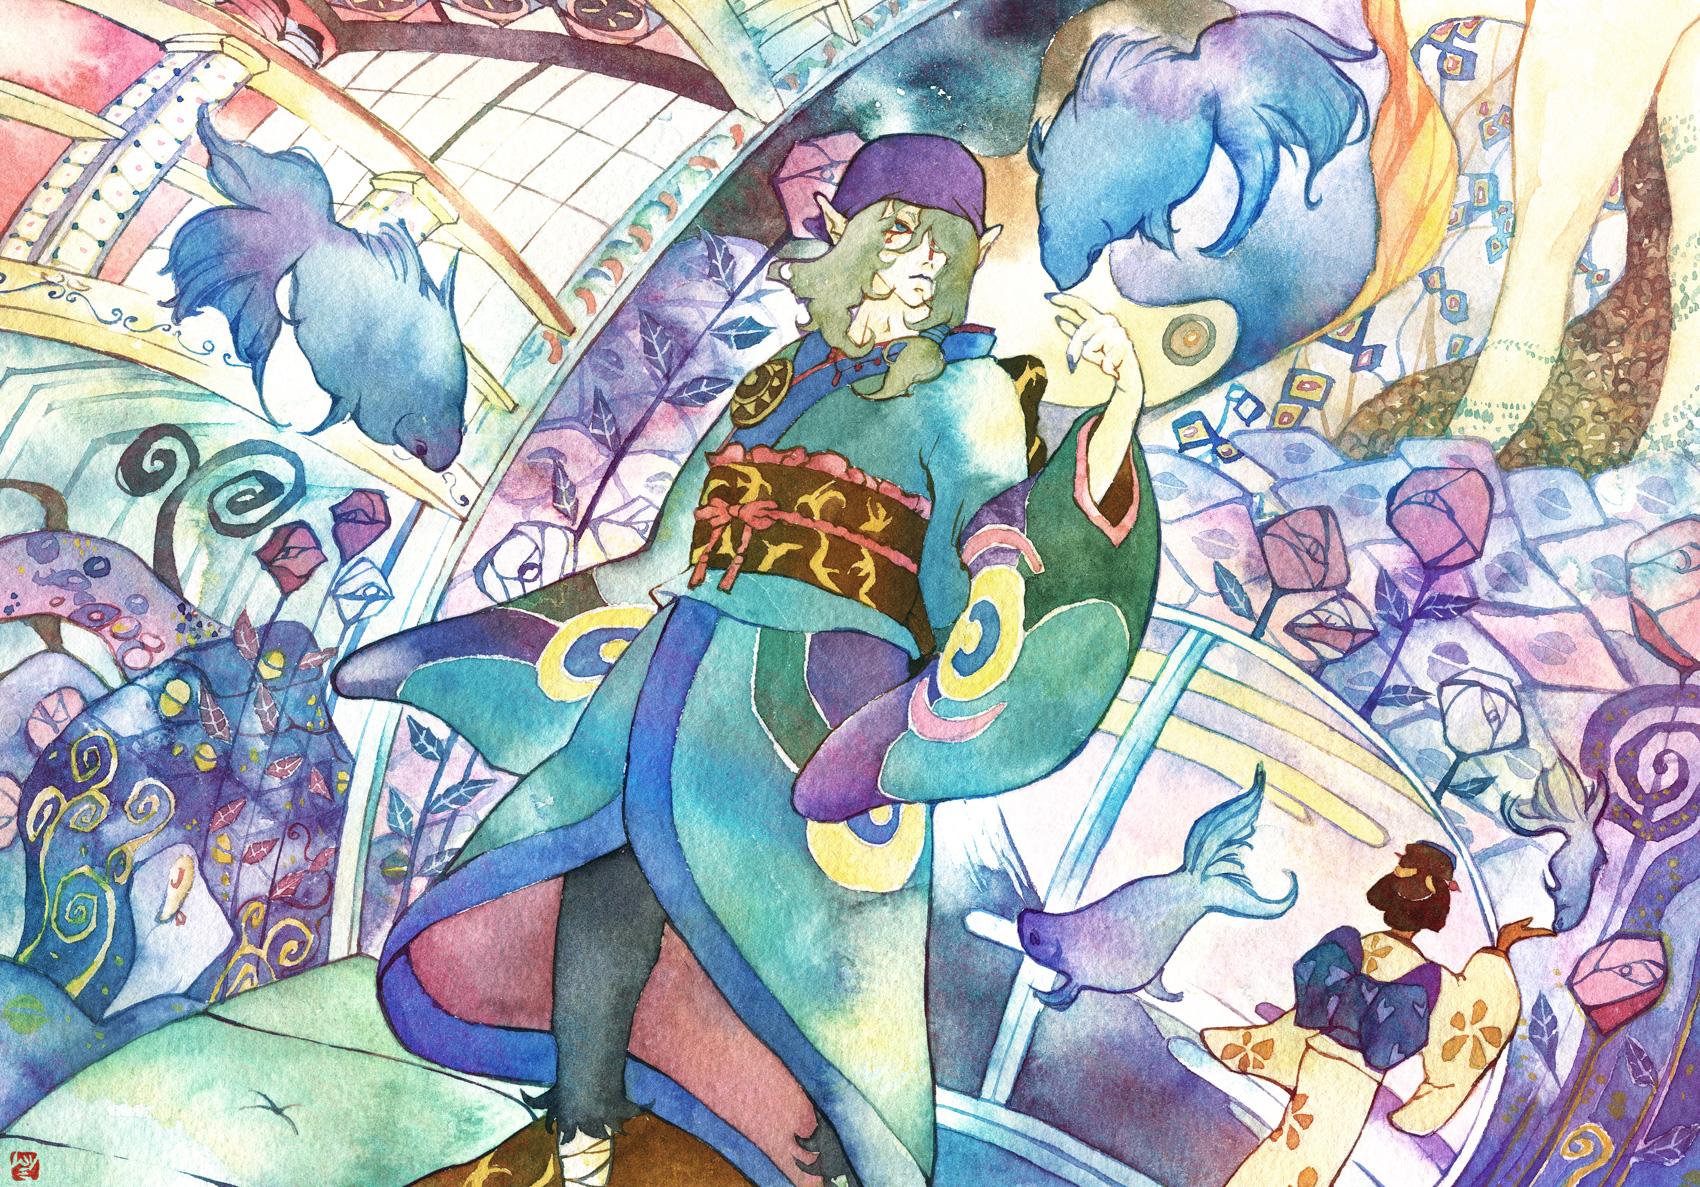 Mononoke wallpaper and background image 1700x1187 id - Mononoke anime wallpaper ...